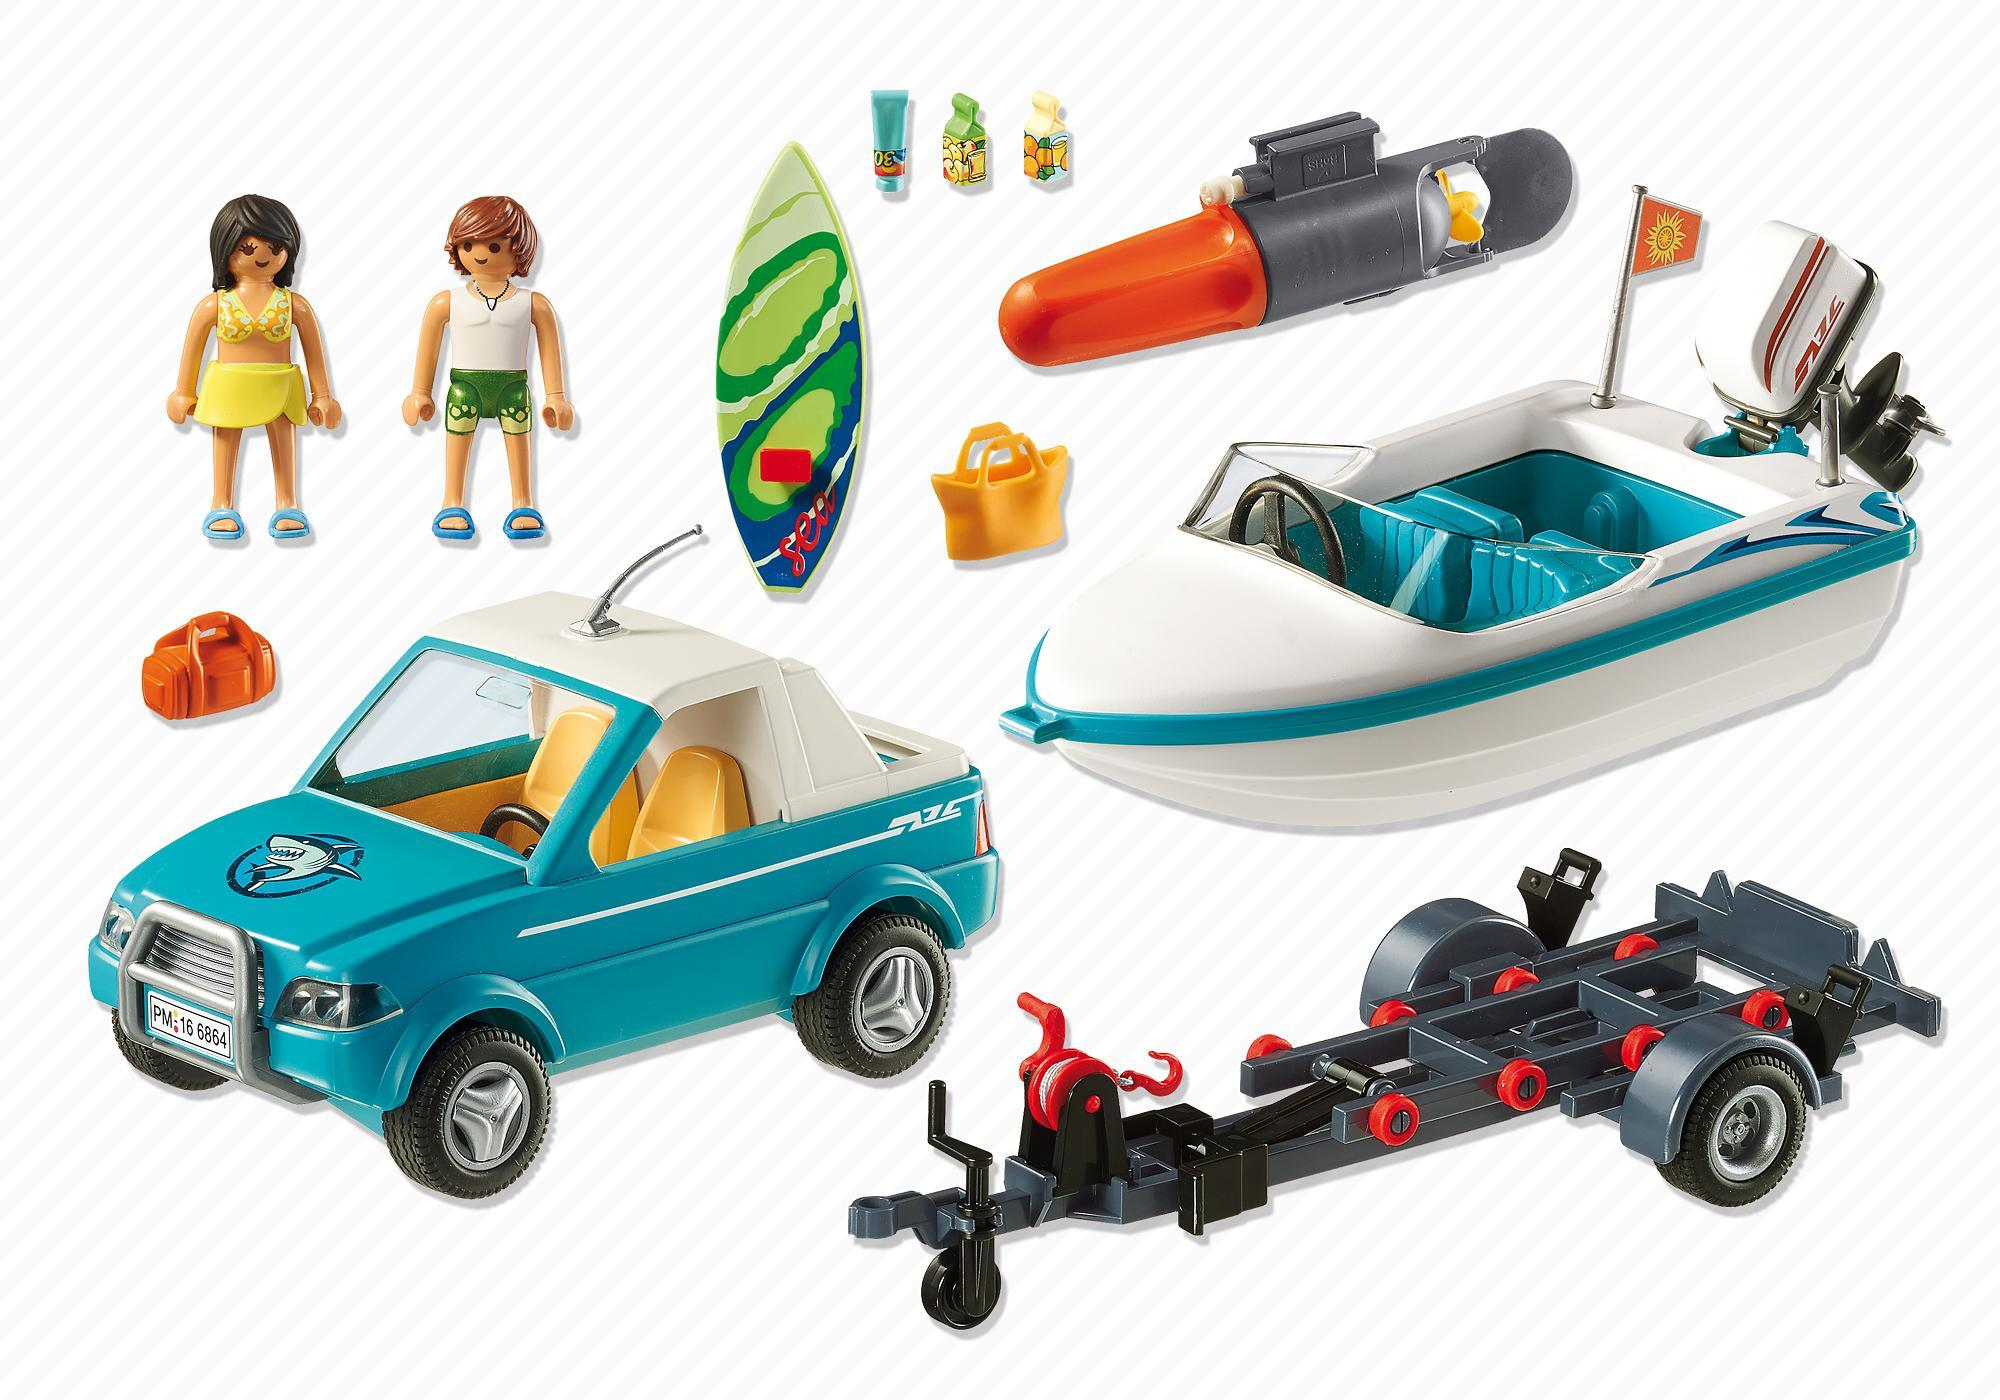 http://media.playmobil.com/i/playmobil/6864_product_box_back/Pick-up met speedboot met onderwatermotor